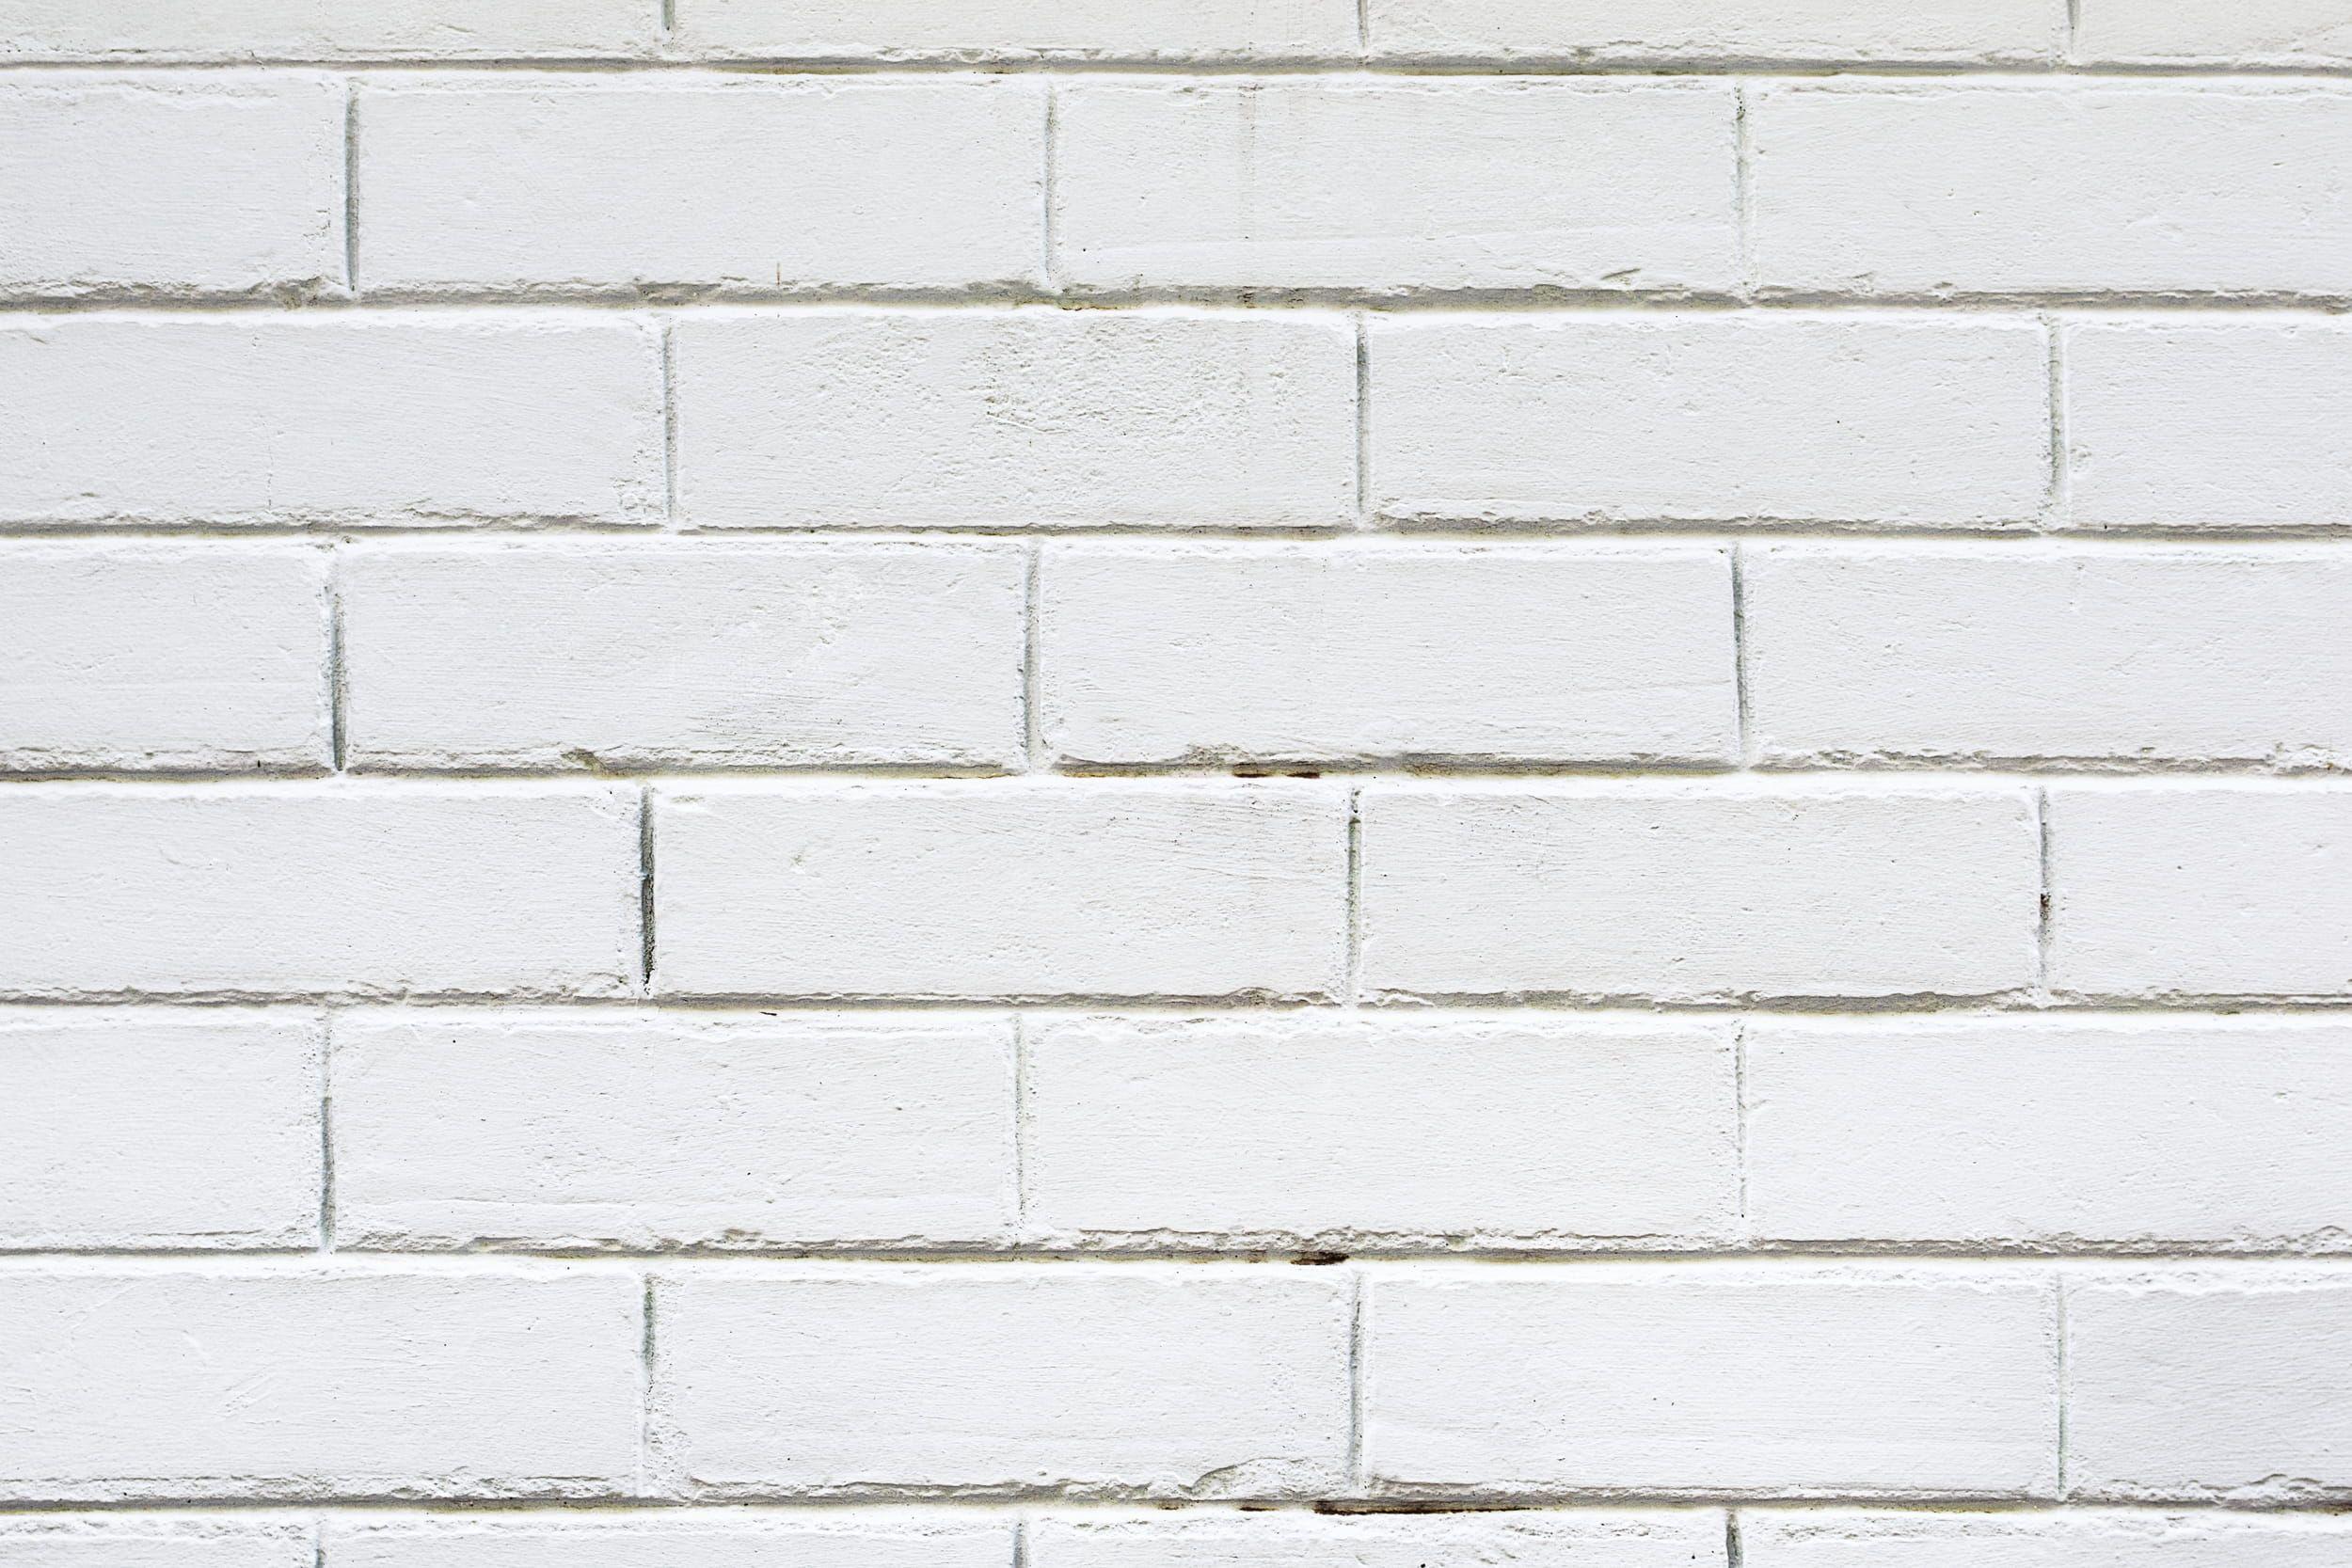 Pin By Charlie Marasigan On My Saves White Brick Background Brick Wall Wallpaper White Brick Walls